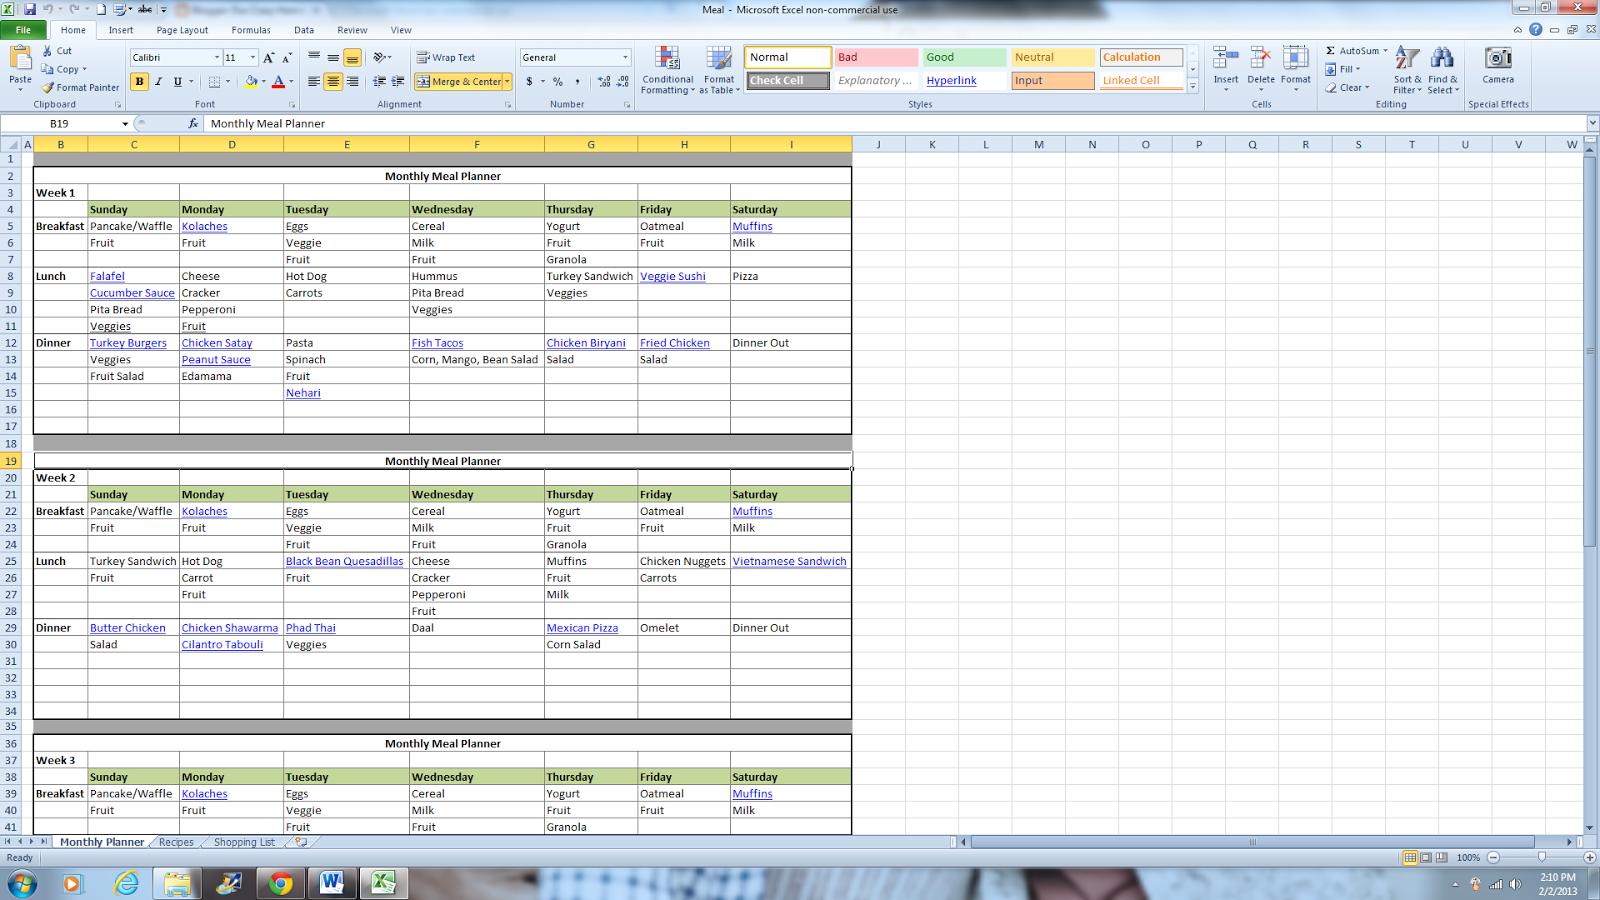 Credit Form Uq   Resume Maker: Create professional resumes online ...